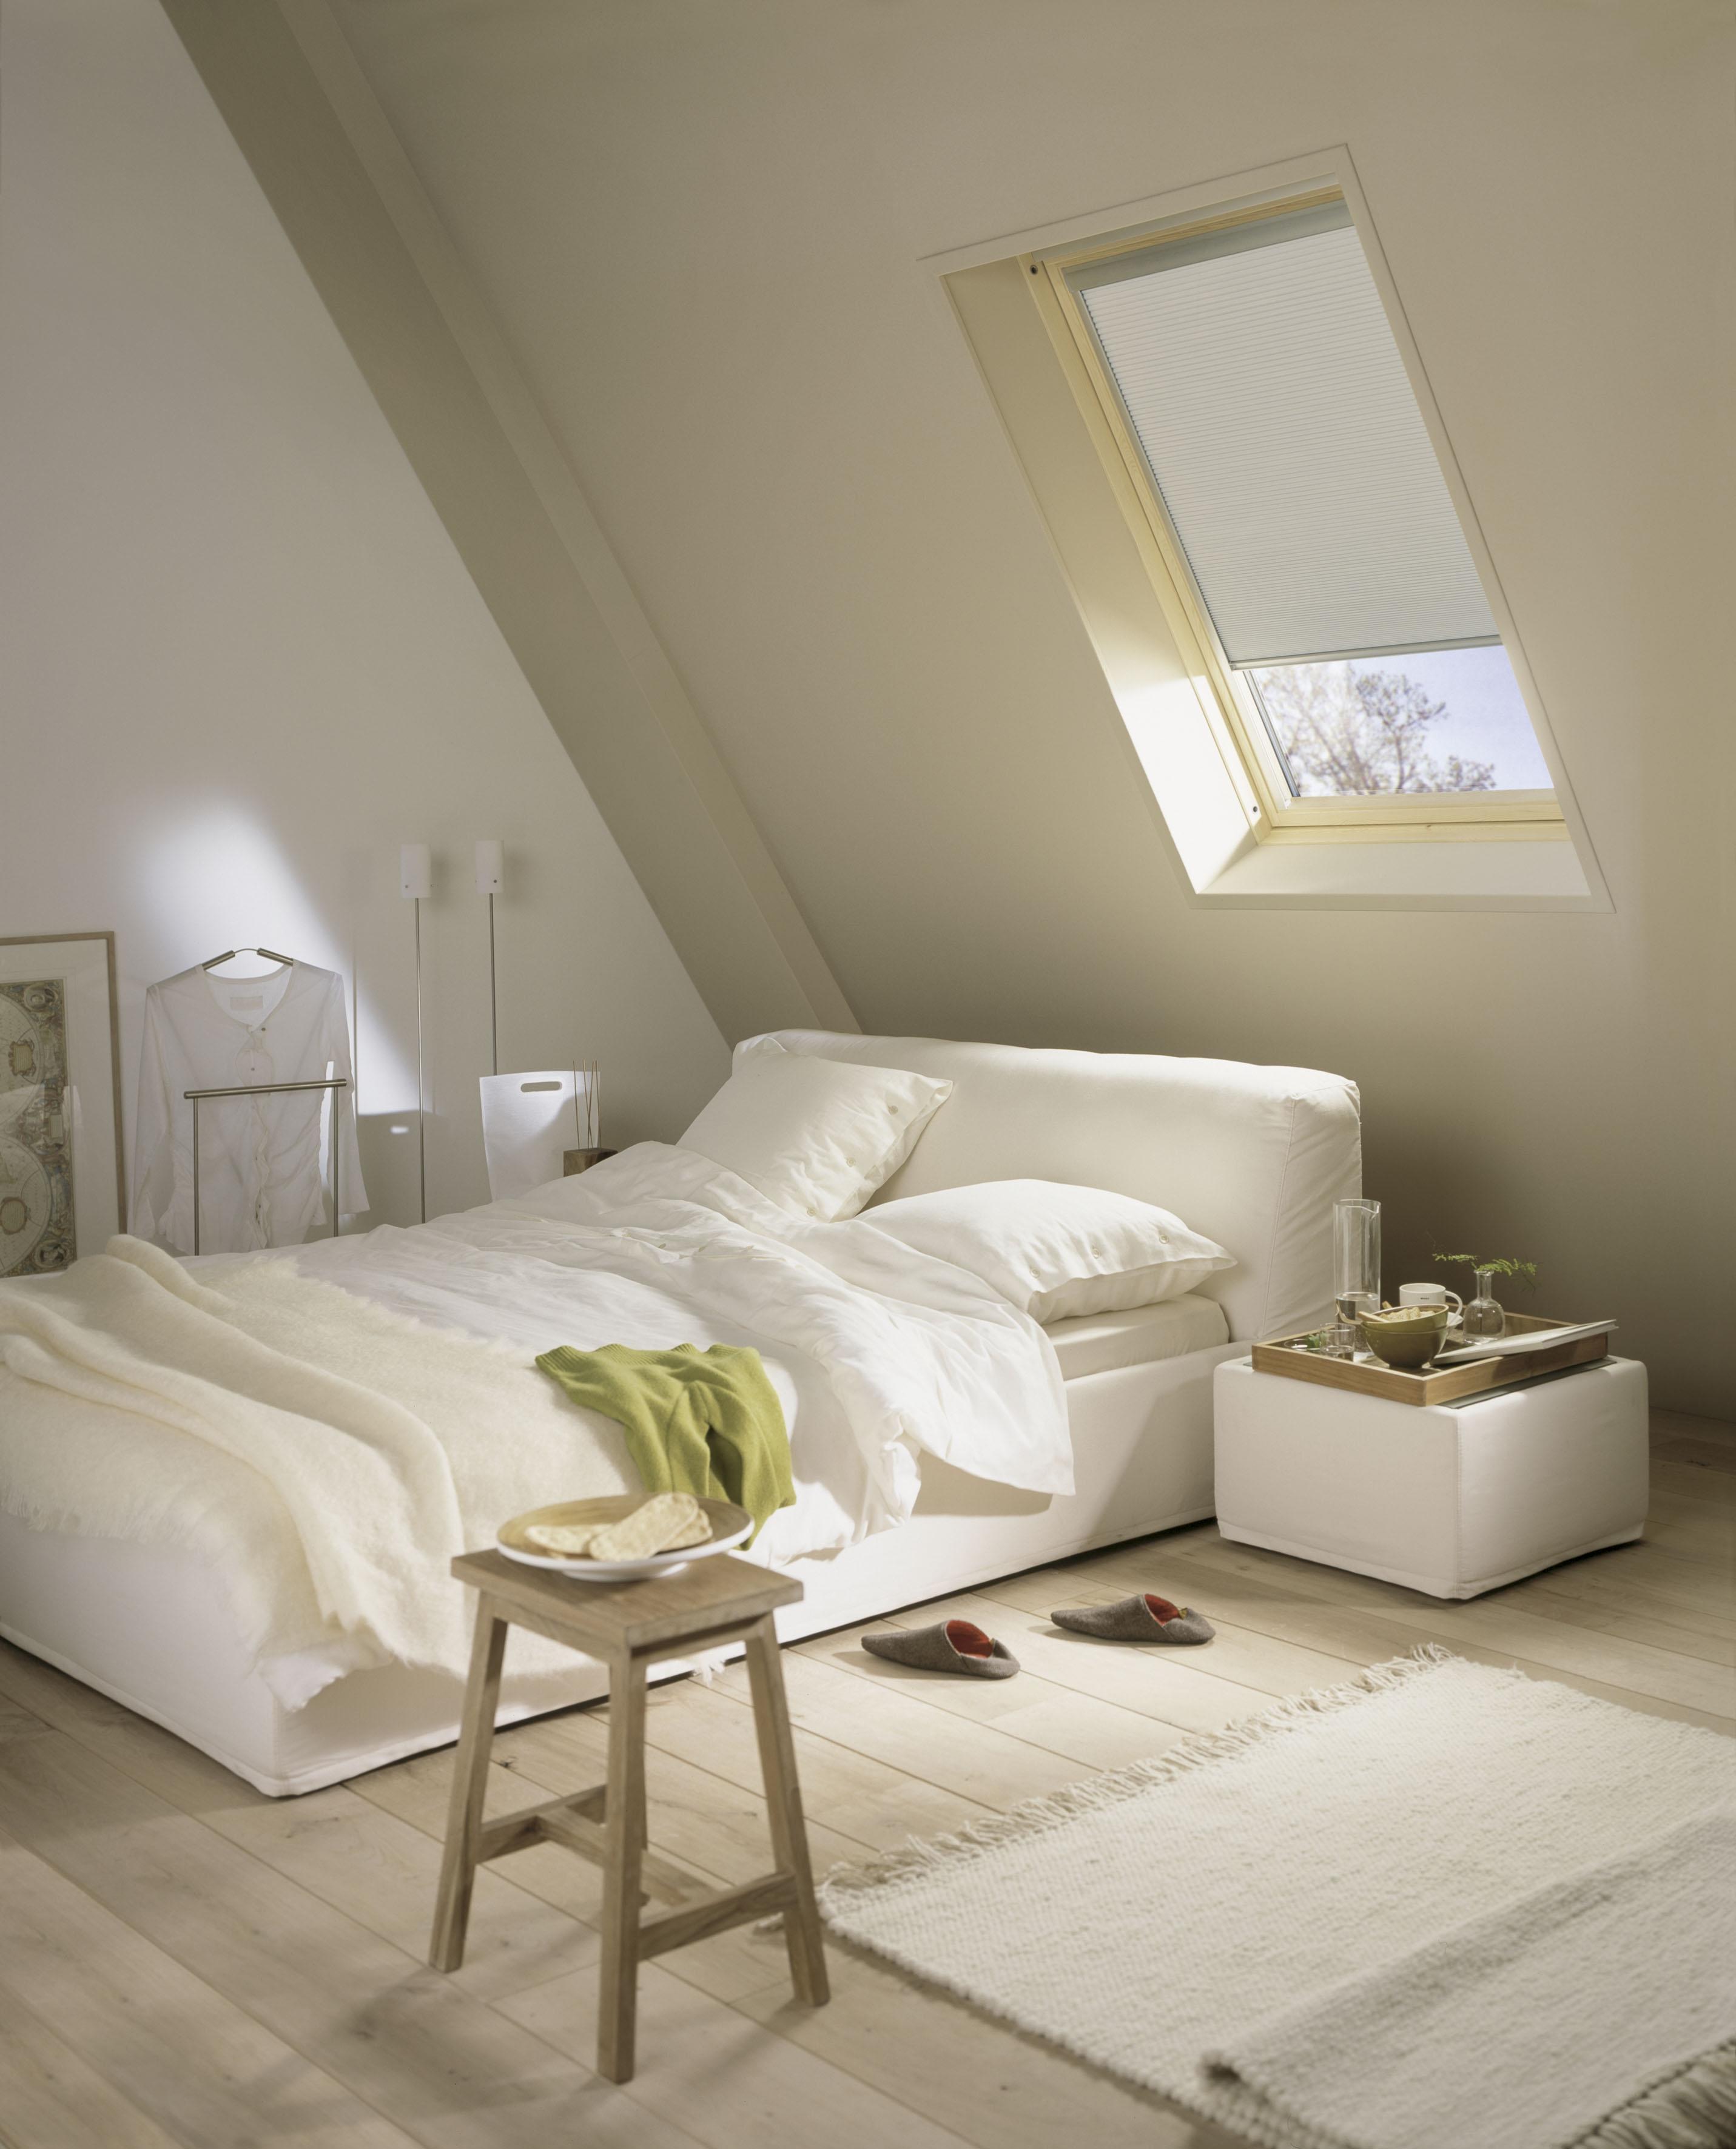 Skylight Shades Energy Efficient The Blind Factory